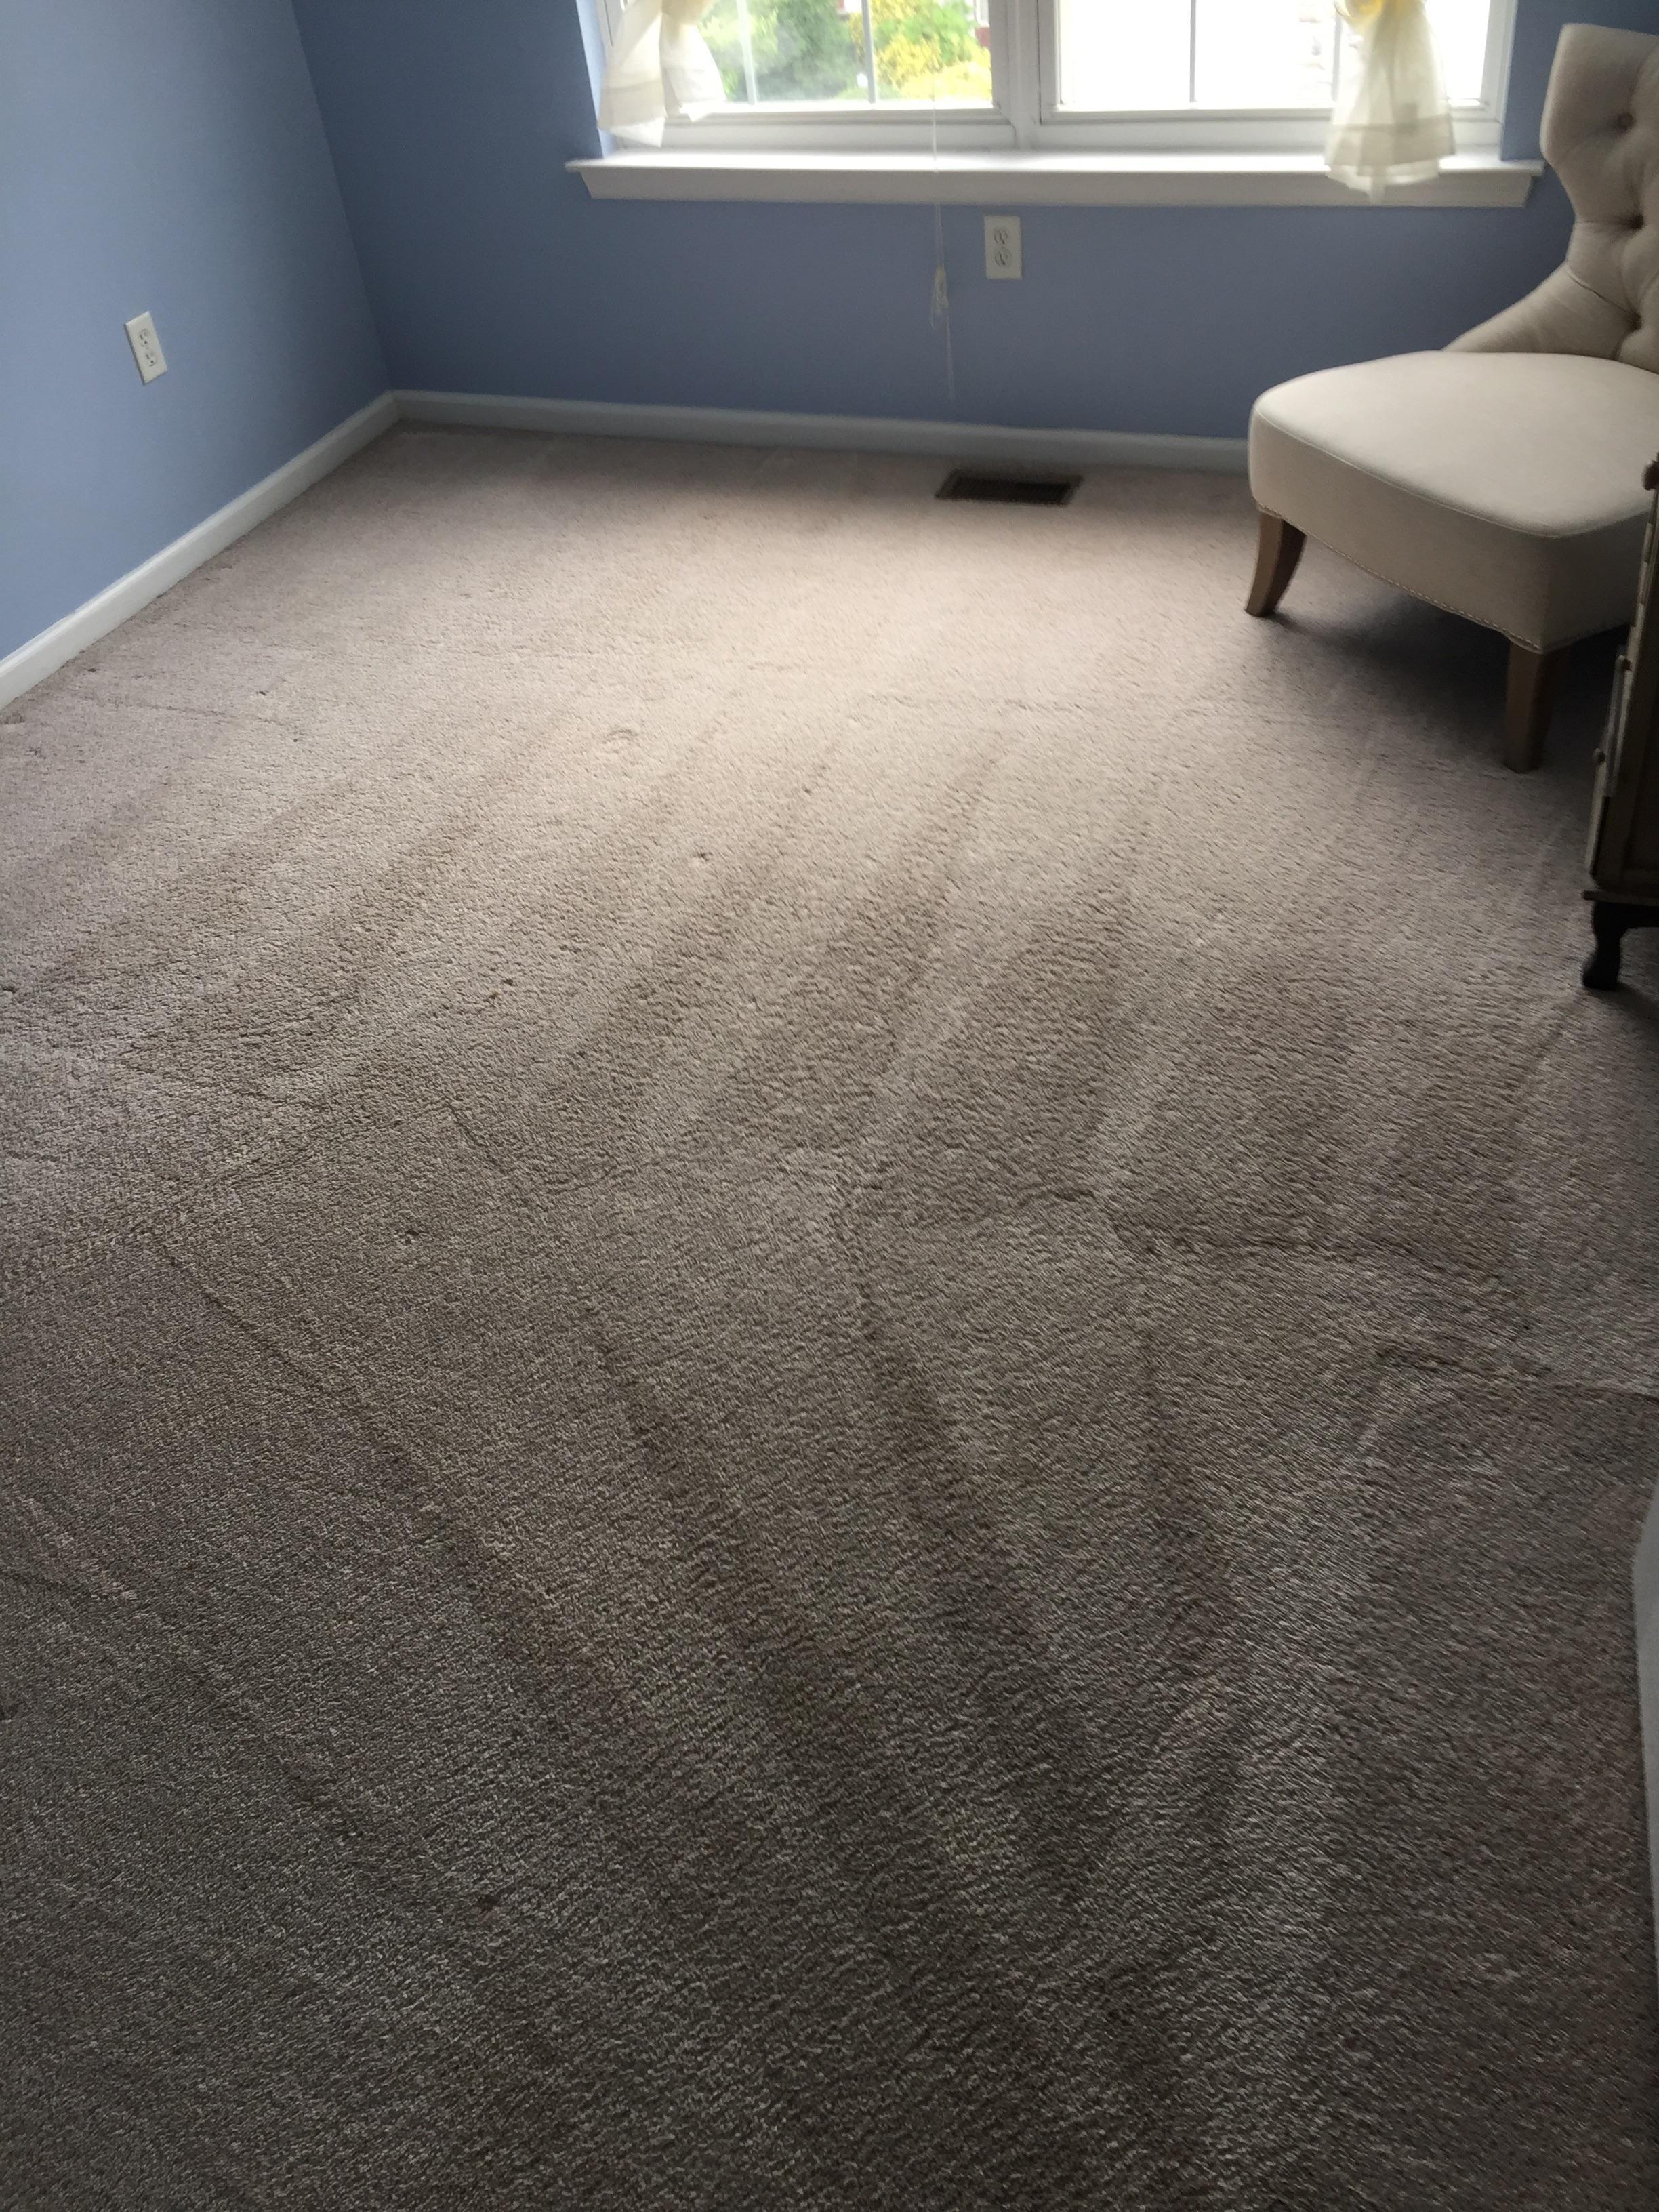 Eco Carpet & Floor Cleaning